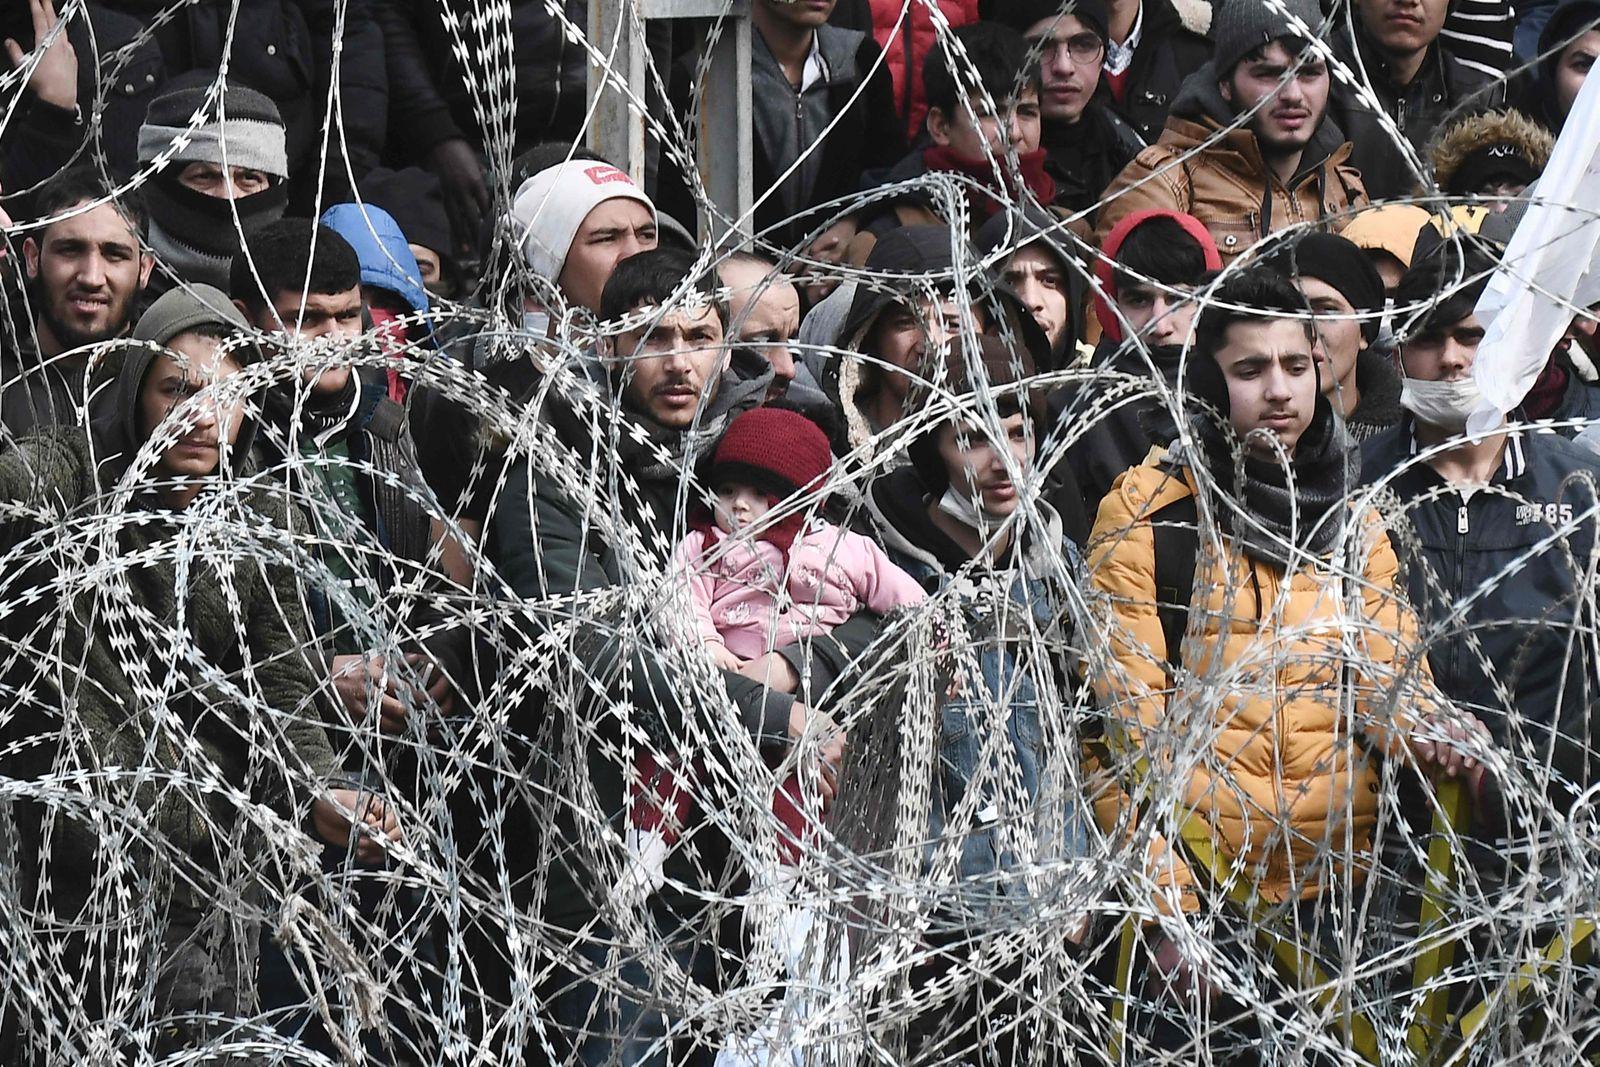 GREECE-TURKEY-EU-MIGRANTS-CONFLICT